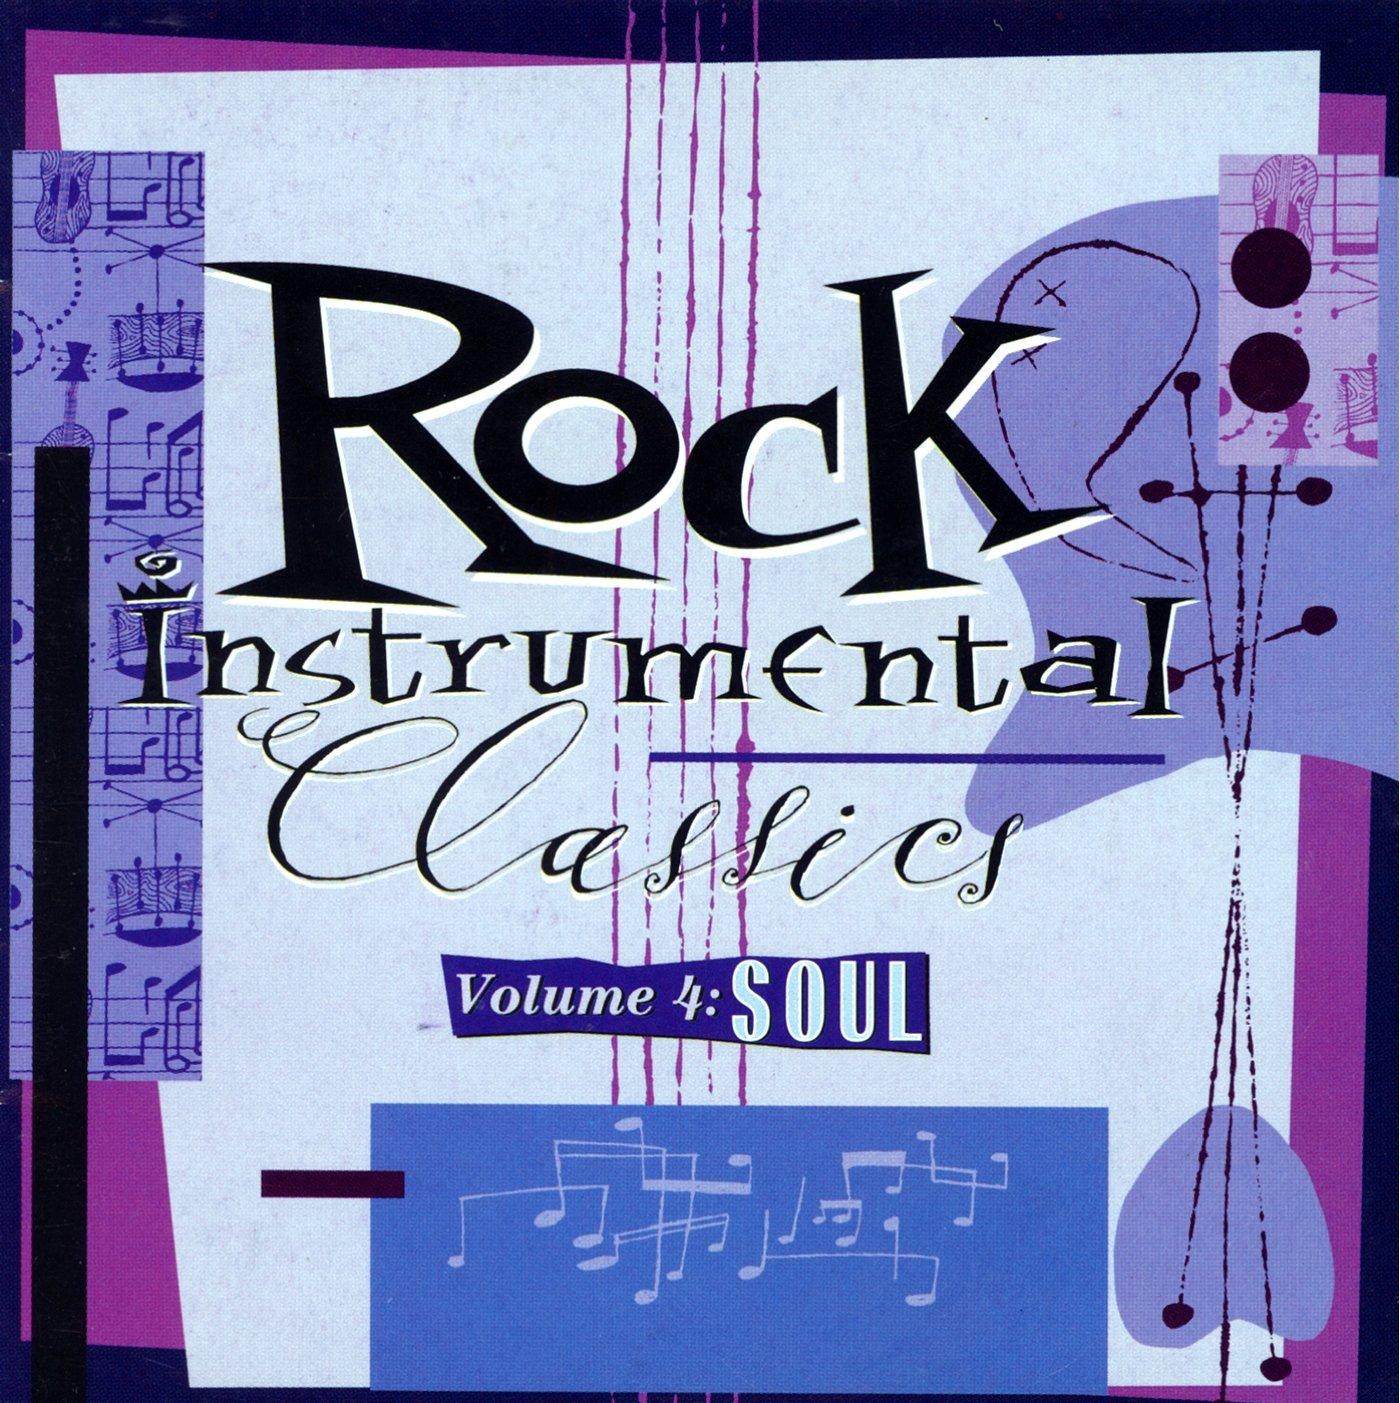 Rock Instrumental Classics, Vol. 4: Soul by ROCK